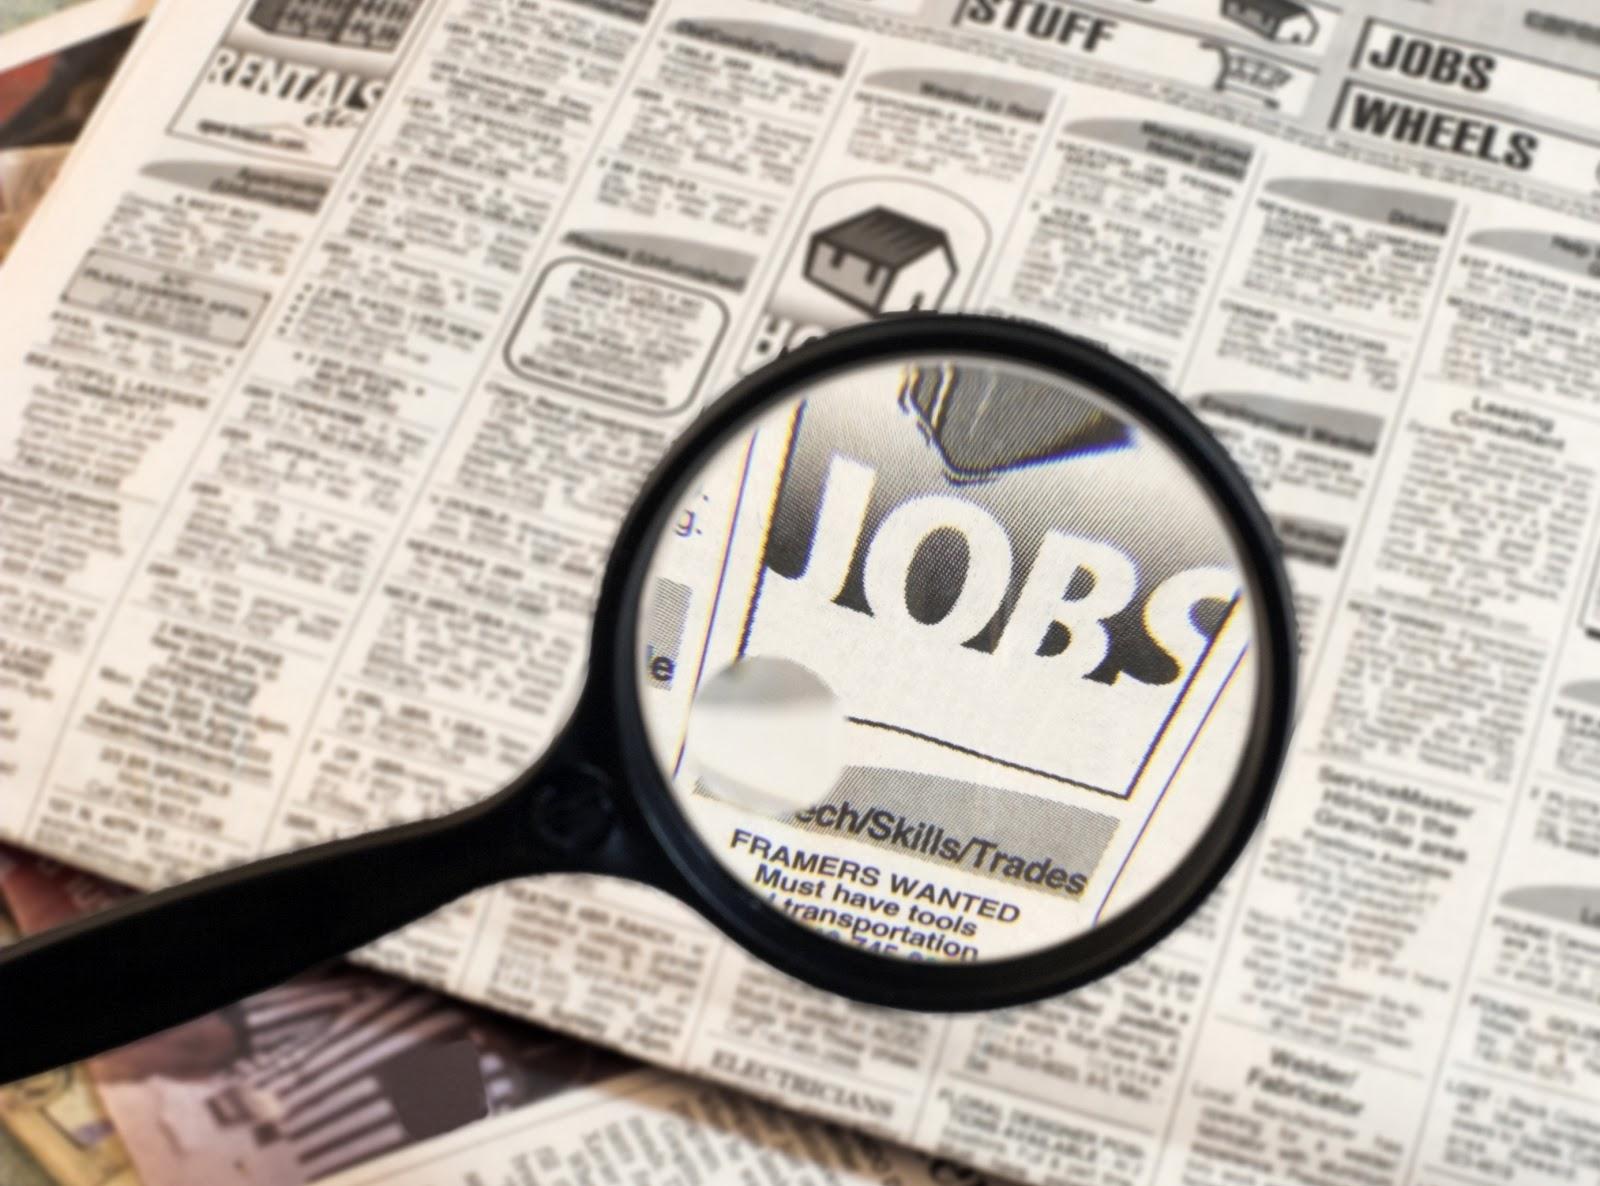 Magnifying glass over newspaper job listing